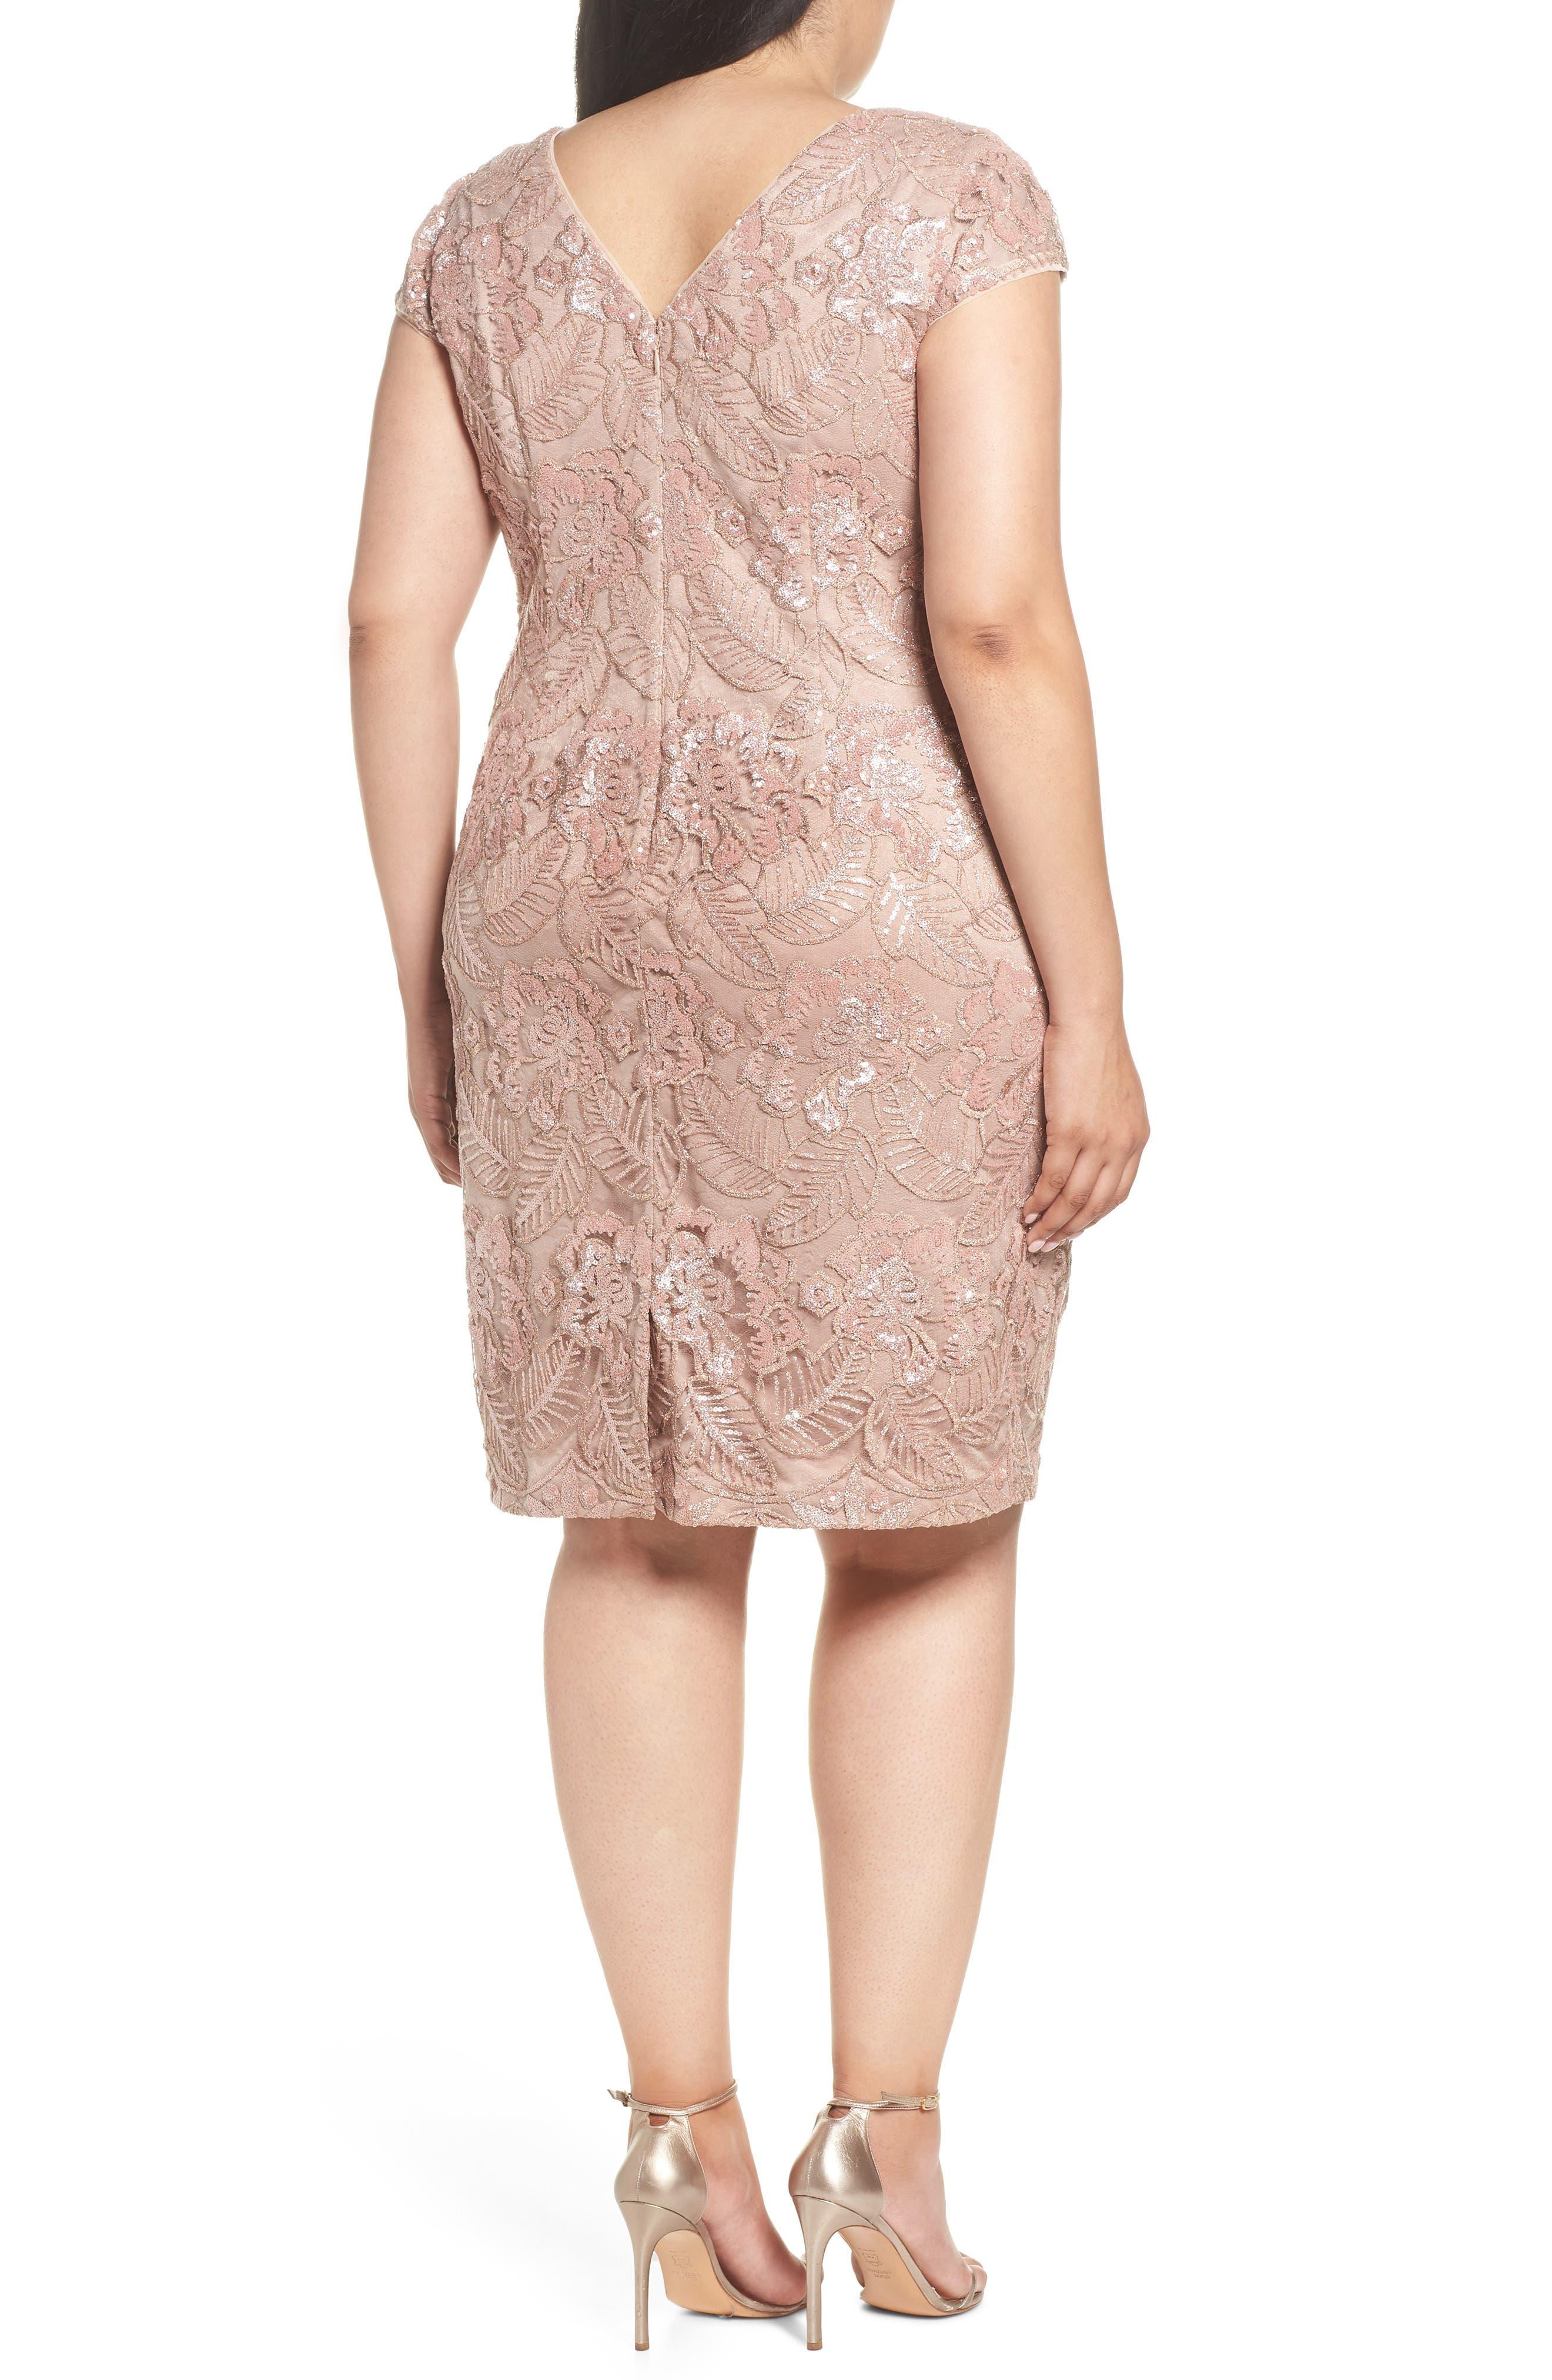 Sequin Lace Cocktail Dress,                             Alternate thumbnail 2, color,                             ROSE GOLD